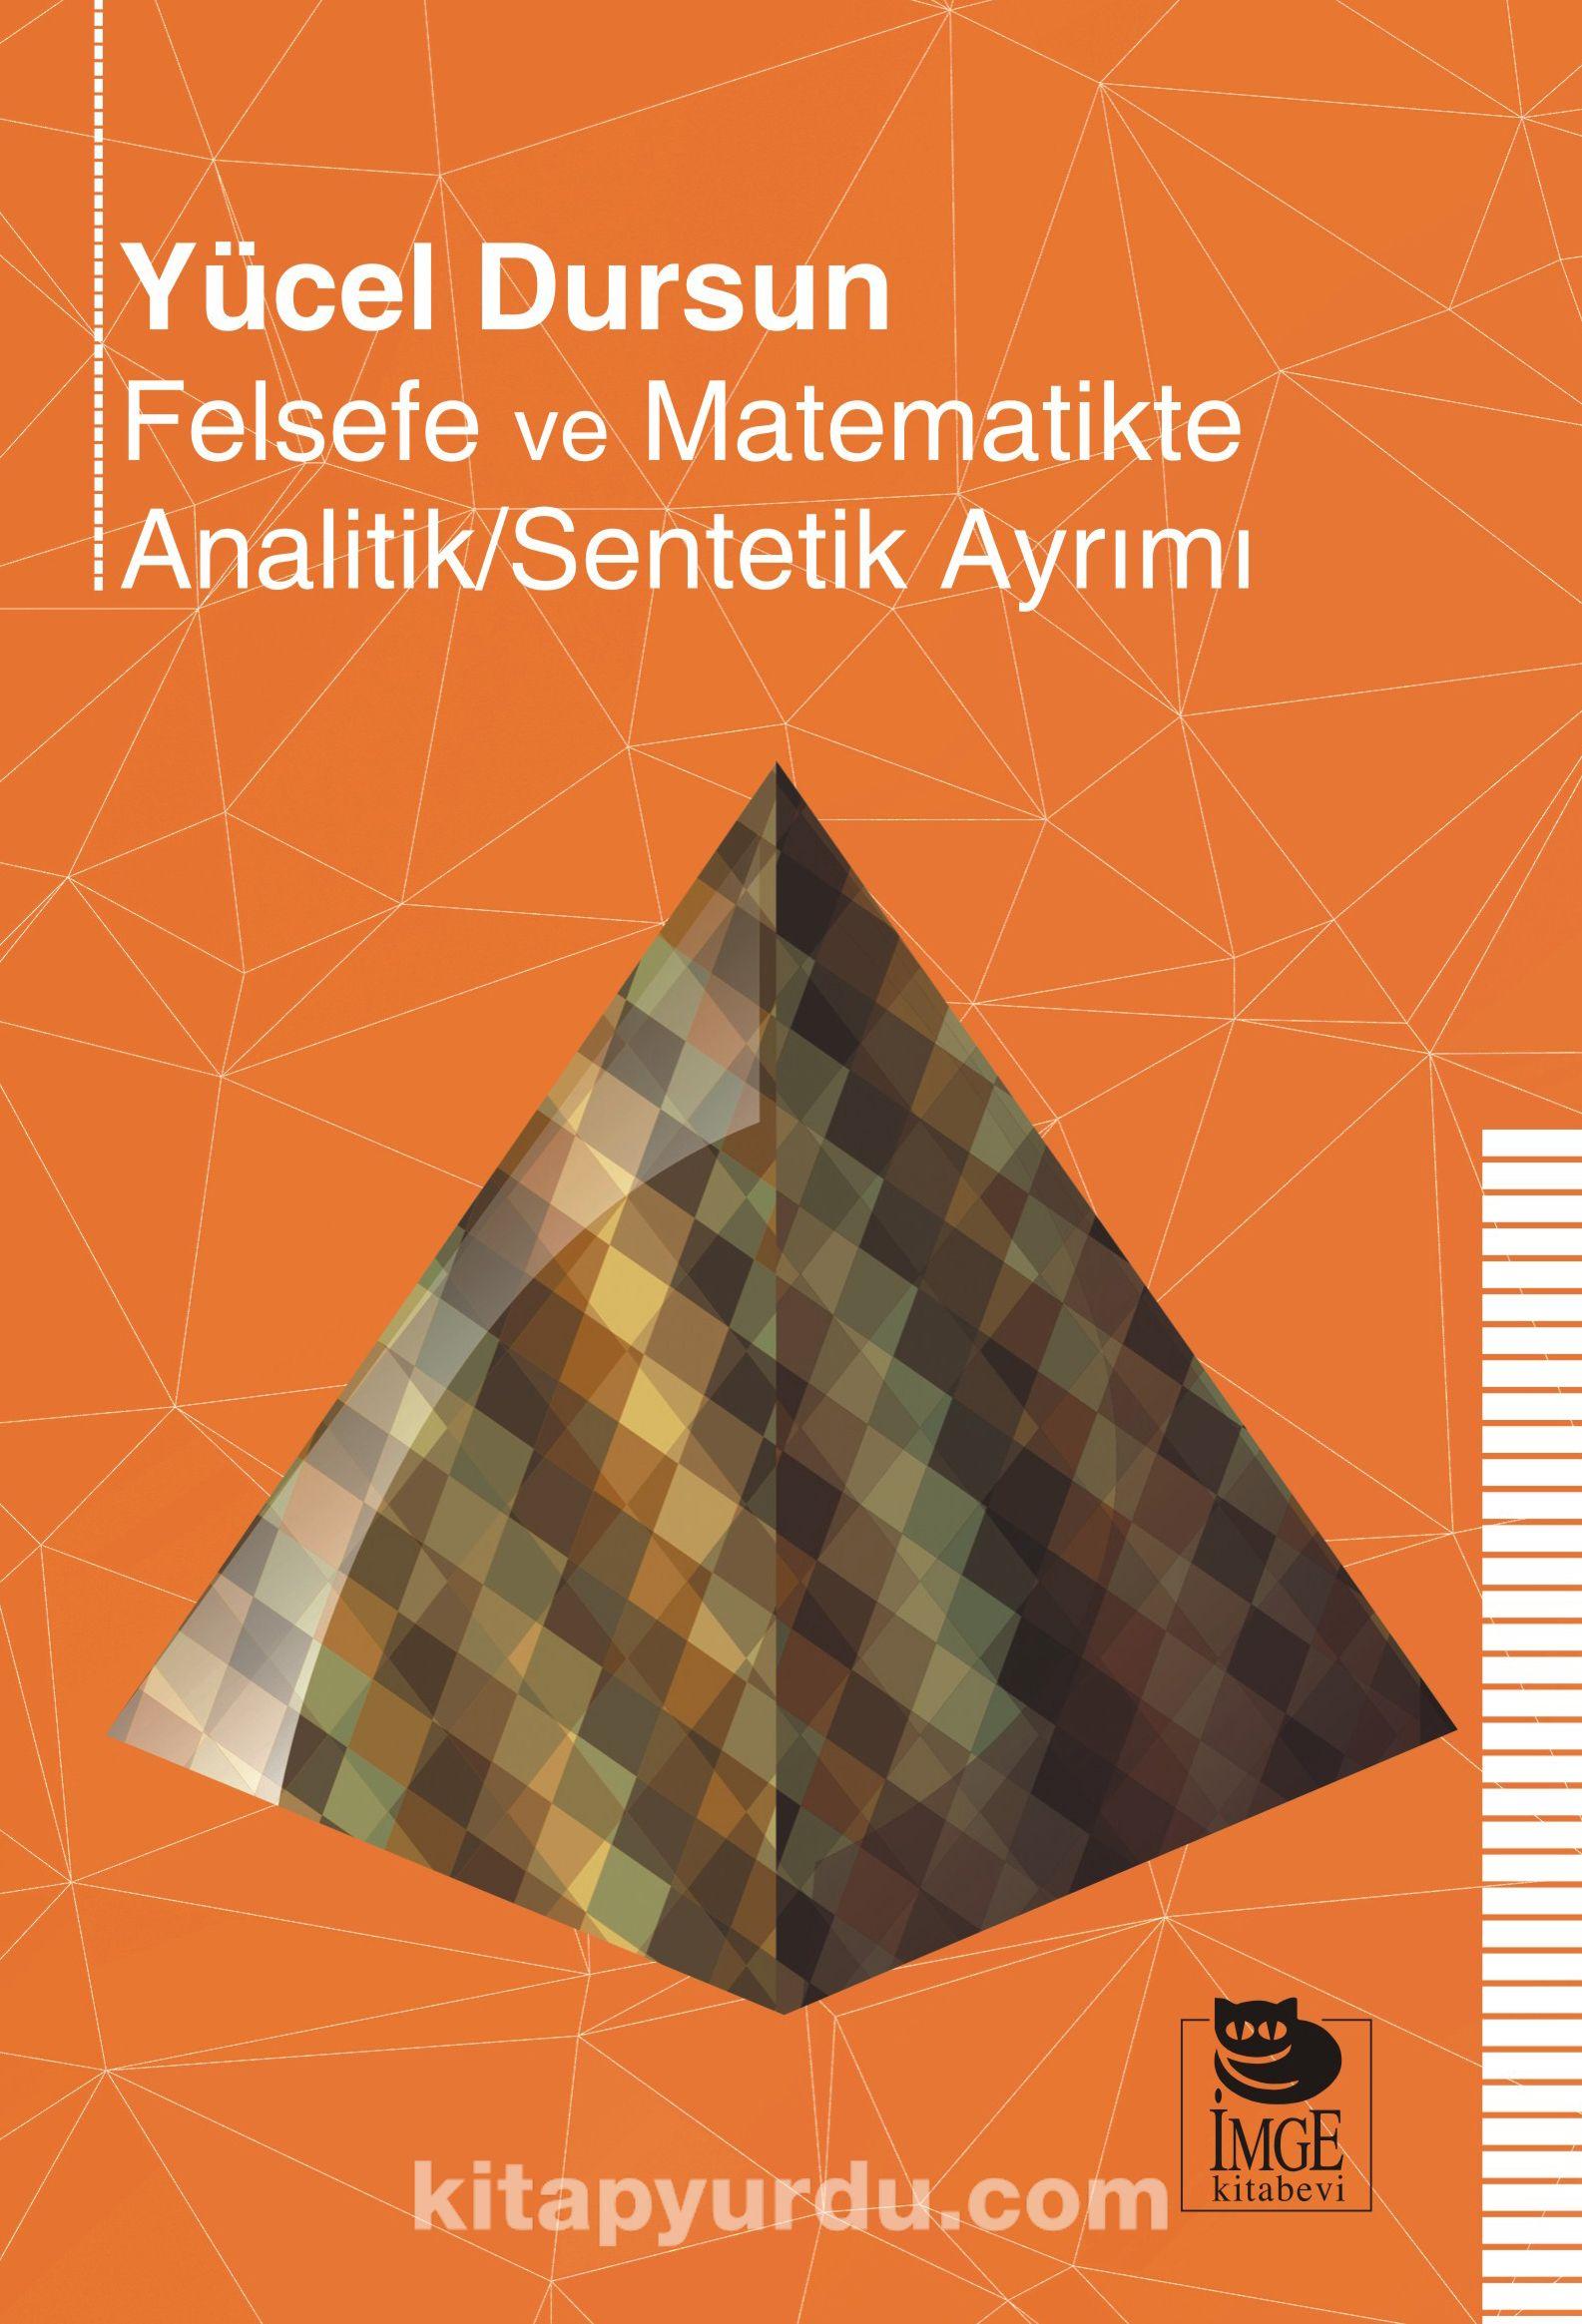 Felsefe ve Matematikte Analitik/Sentetik Ayrımı - Yücel Dursun pdf epub